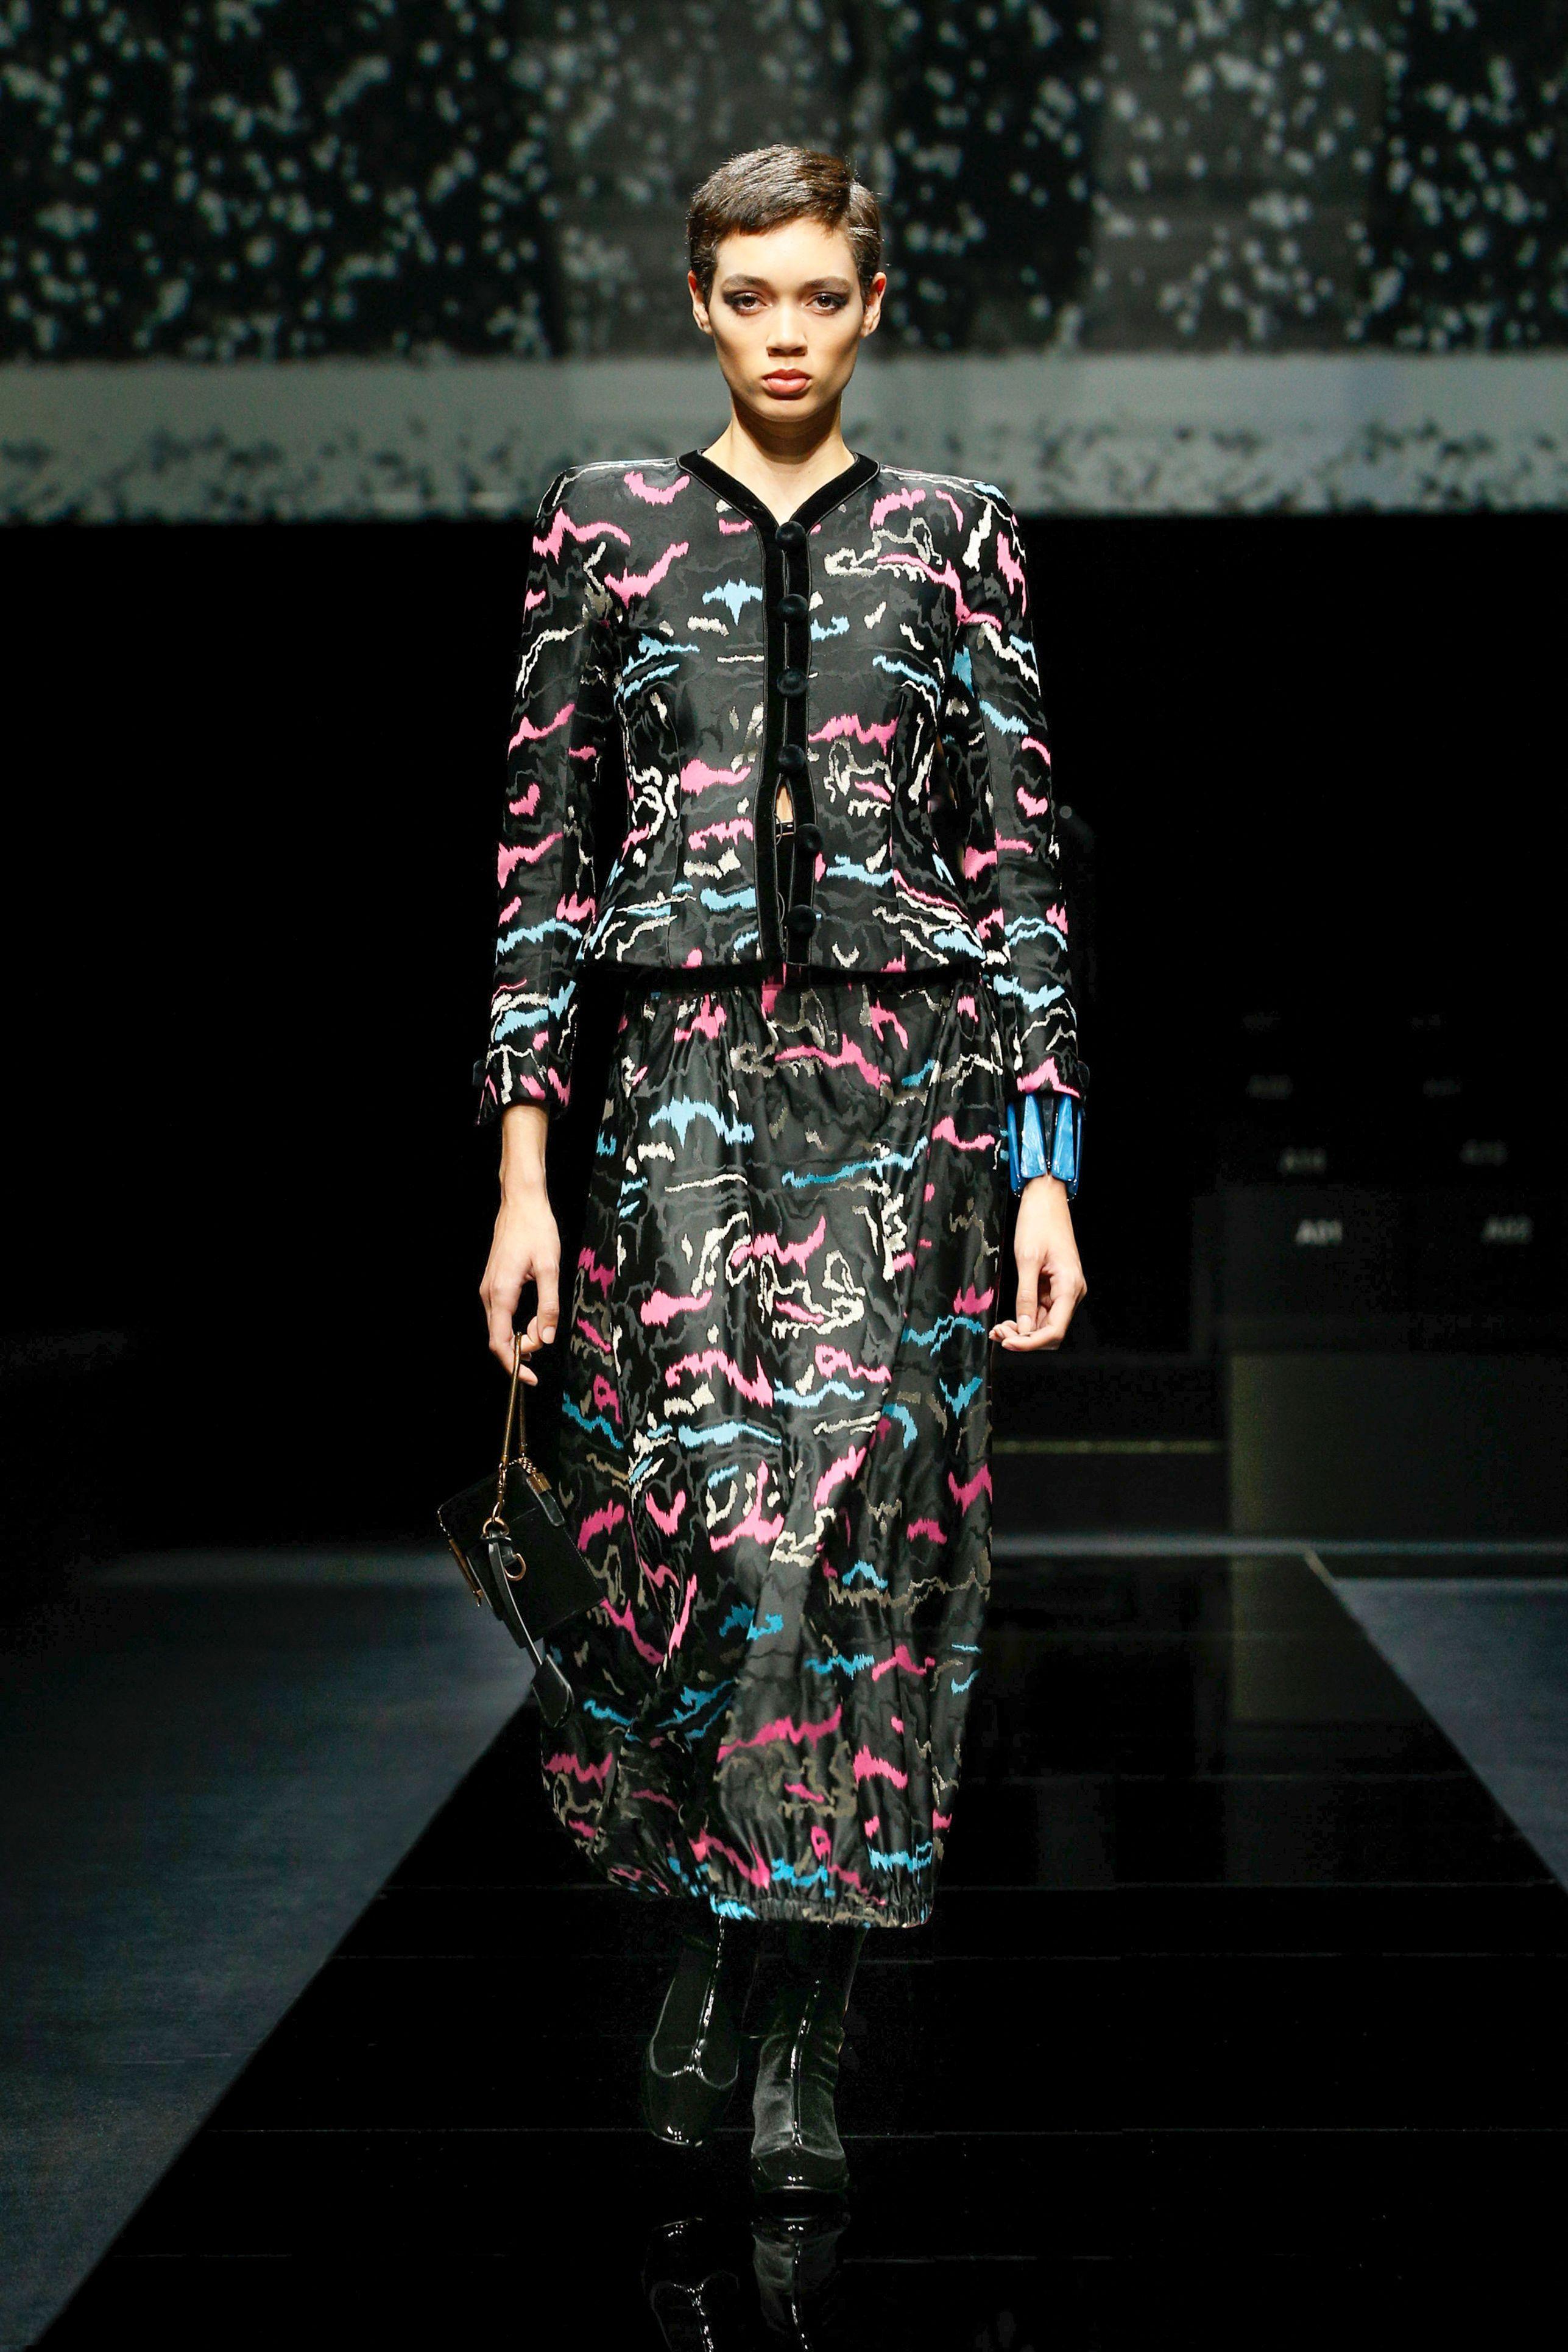 Best Looks At Milan Fashion Week Fall Winter 2020 Gucci Alberta Ferrertti And More At Mfw